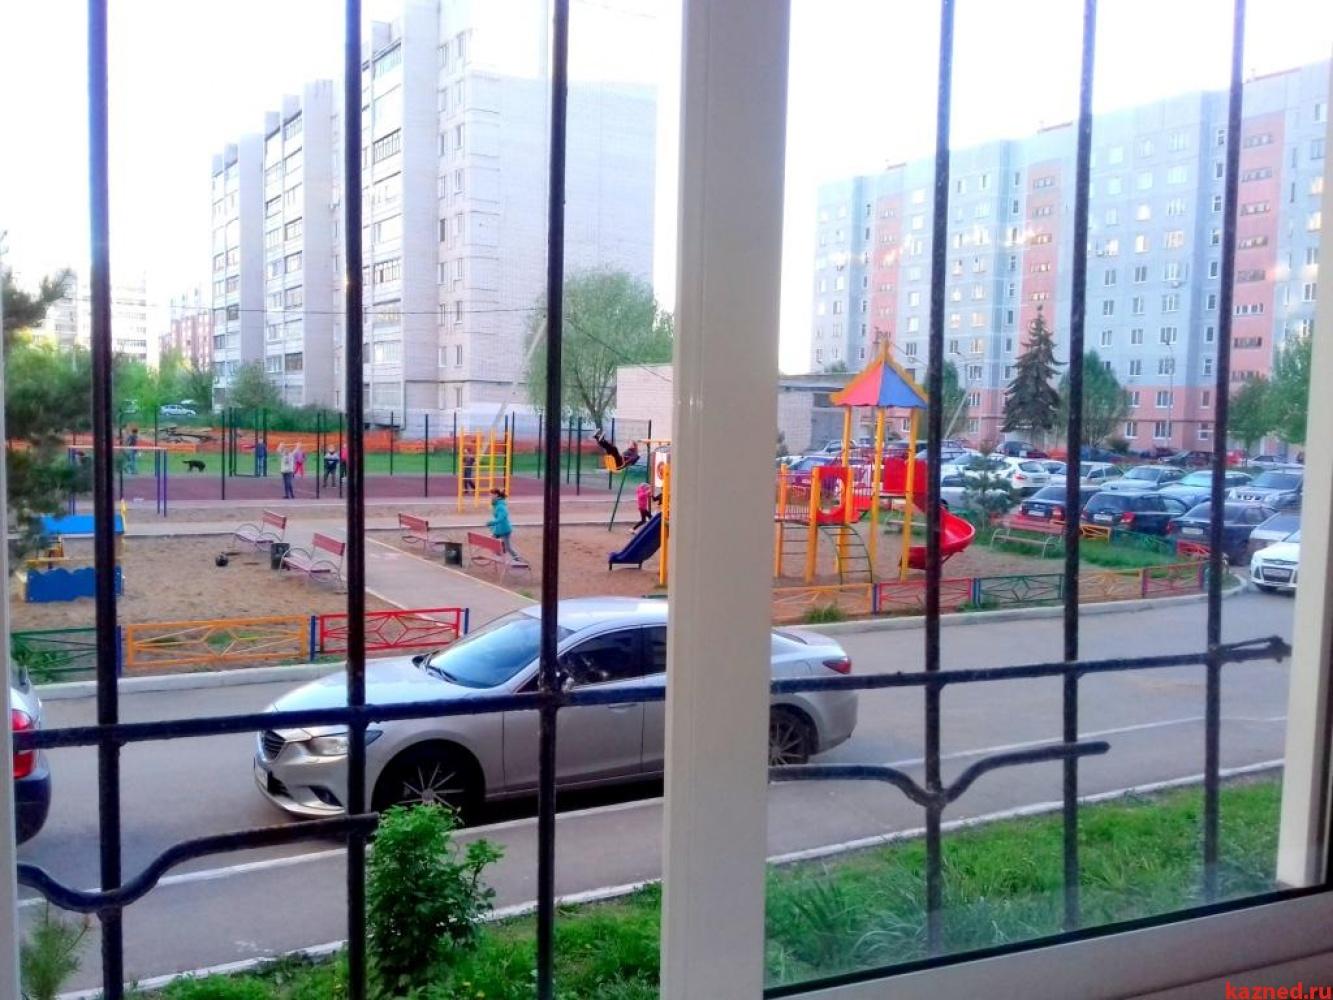 Продажа 3-к квартиры Лукина, 16, 69 м² (миниатюра №22)